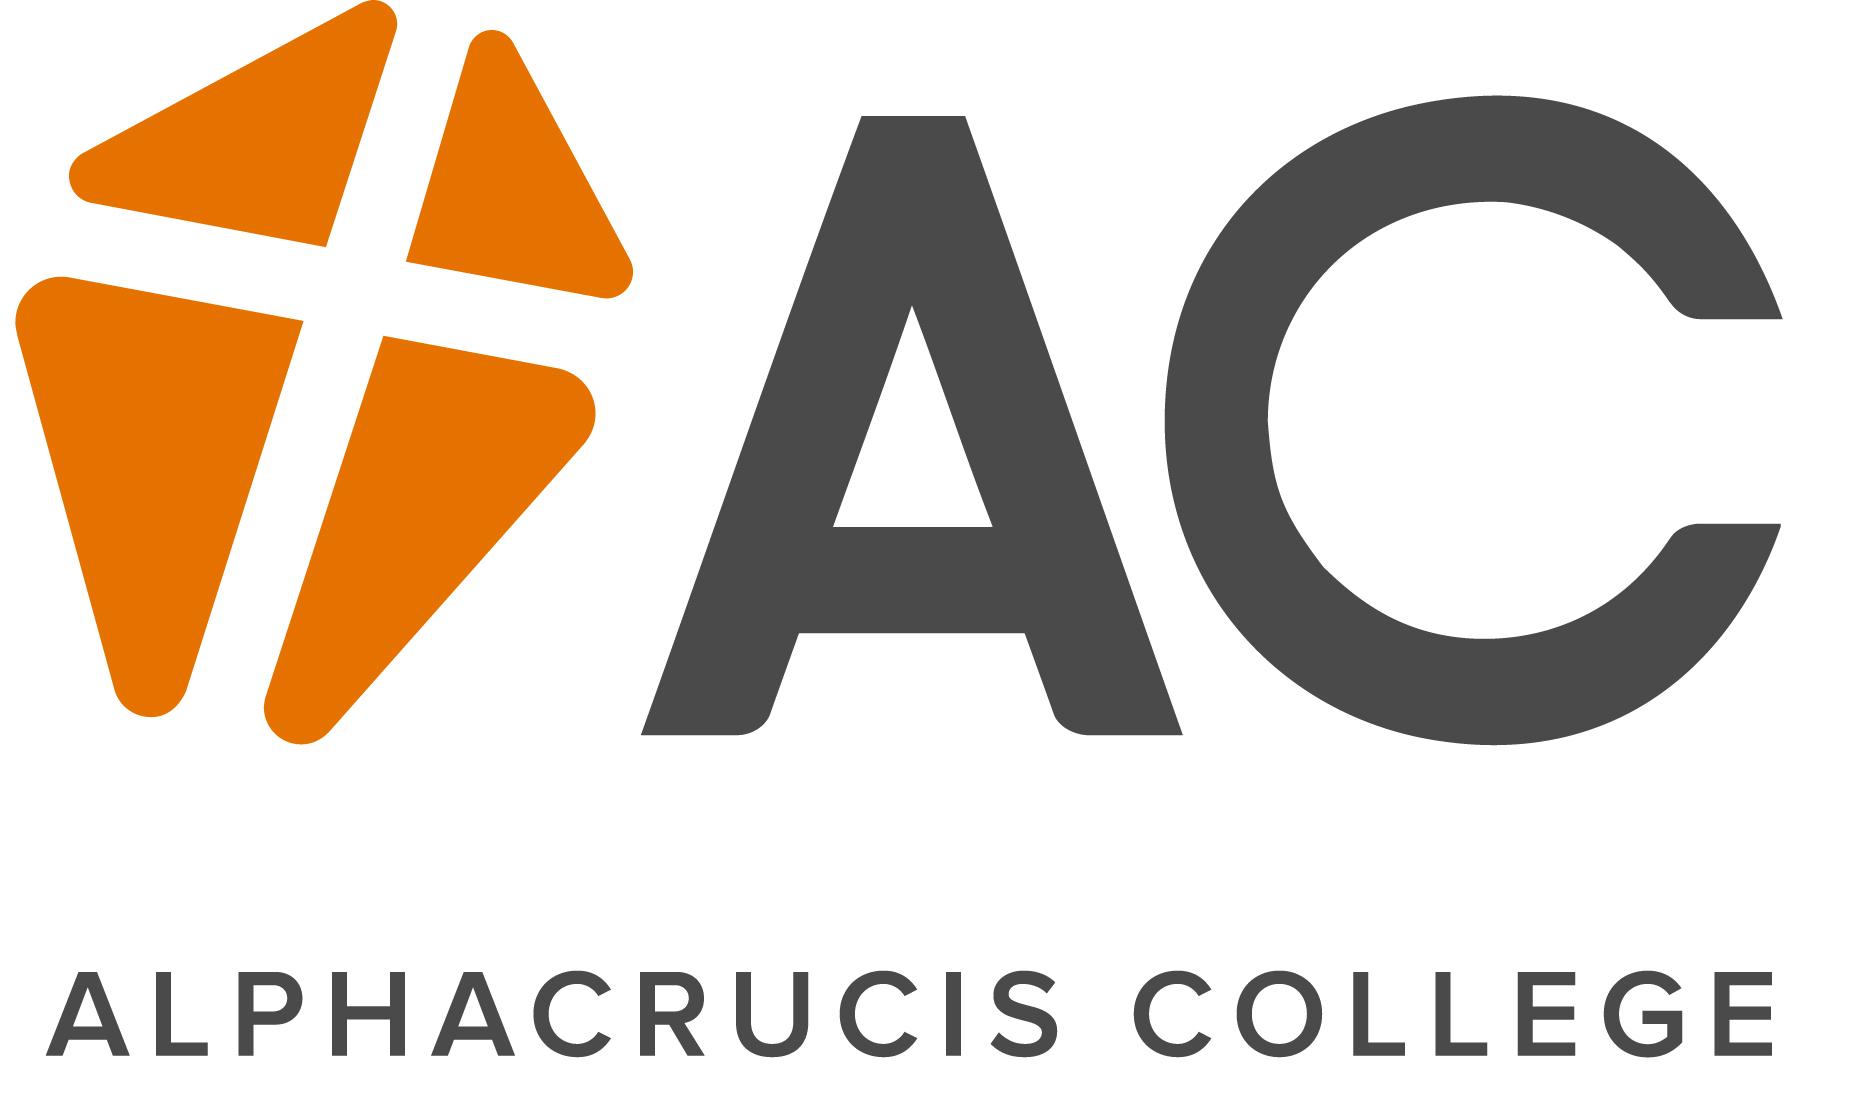 Alphacrcucis